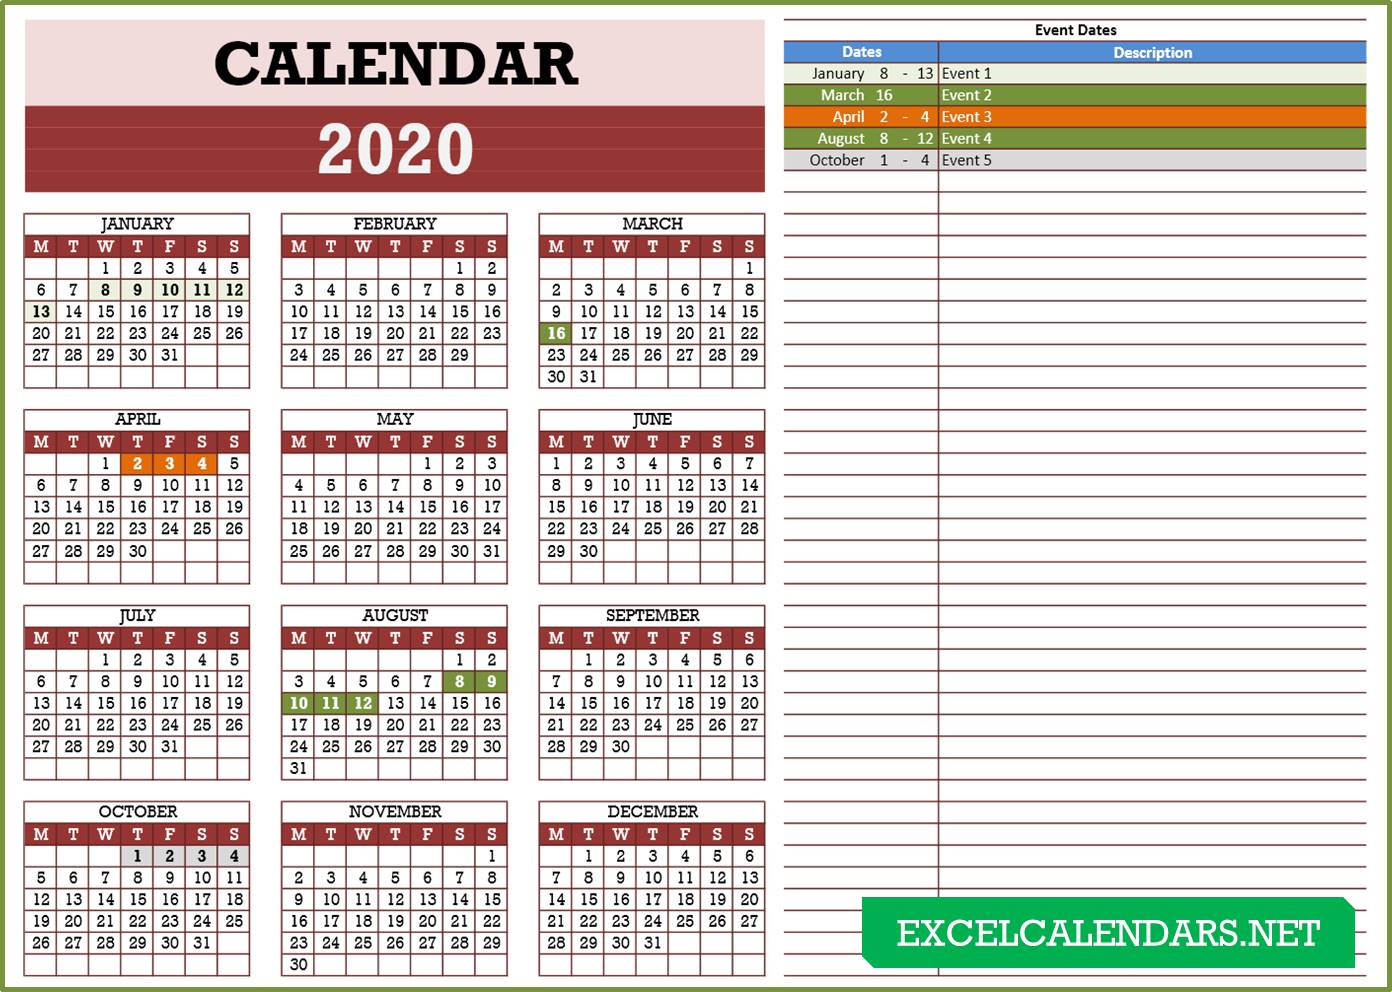 2019 Excel Calendar Template - Model 2